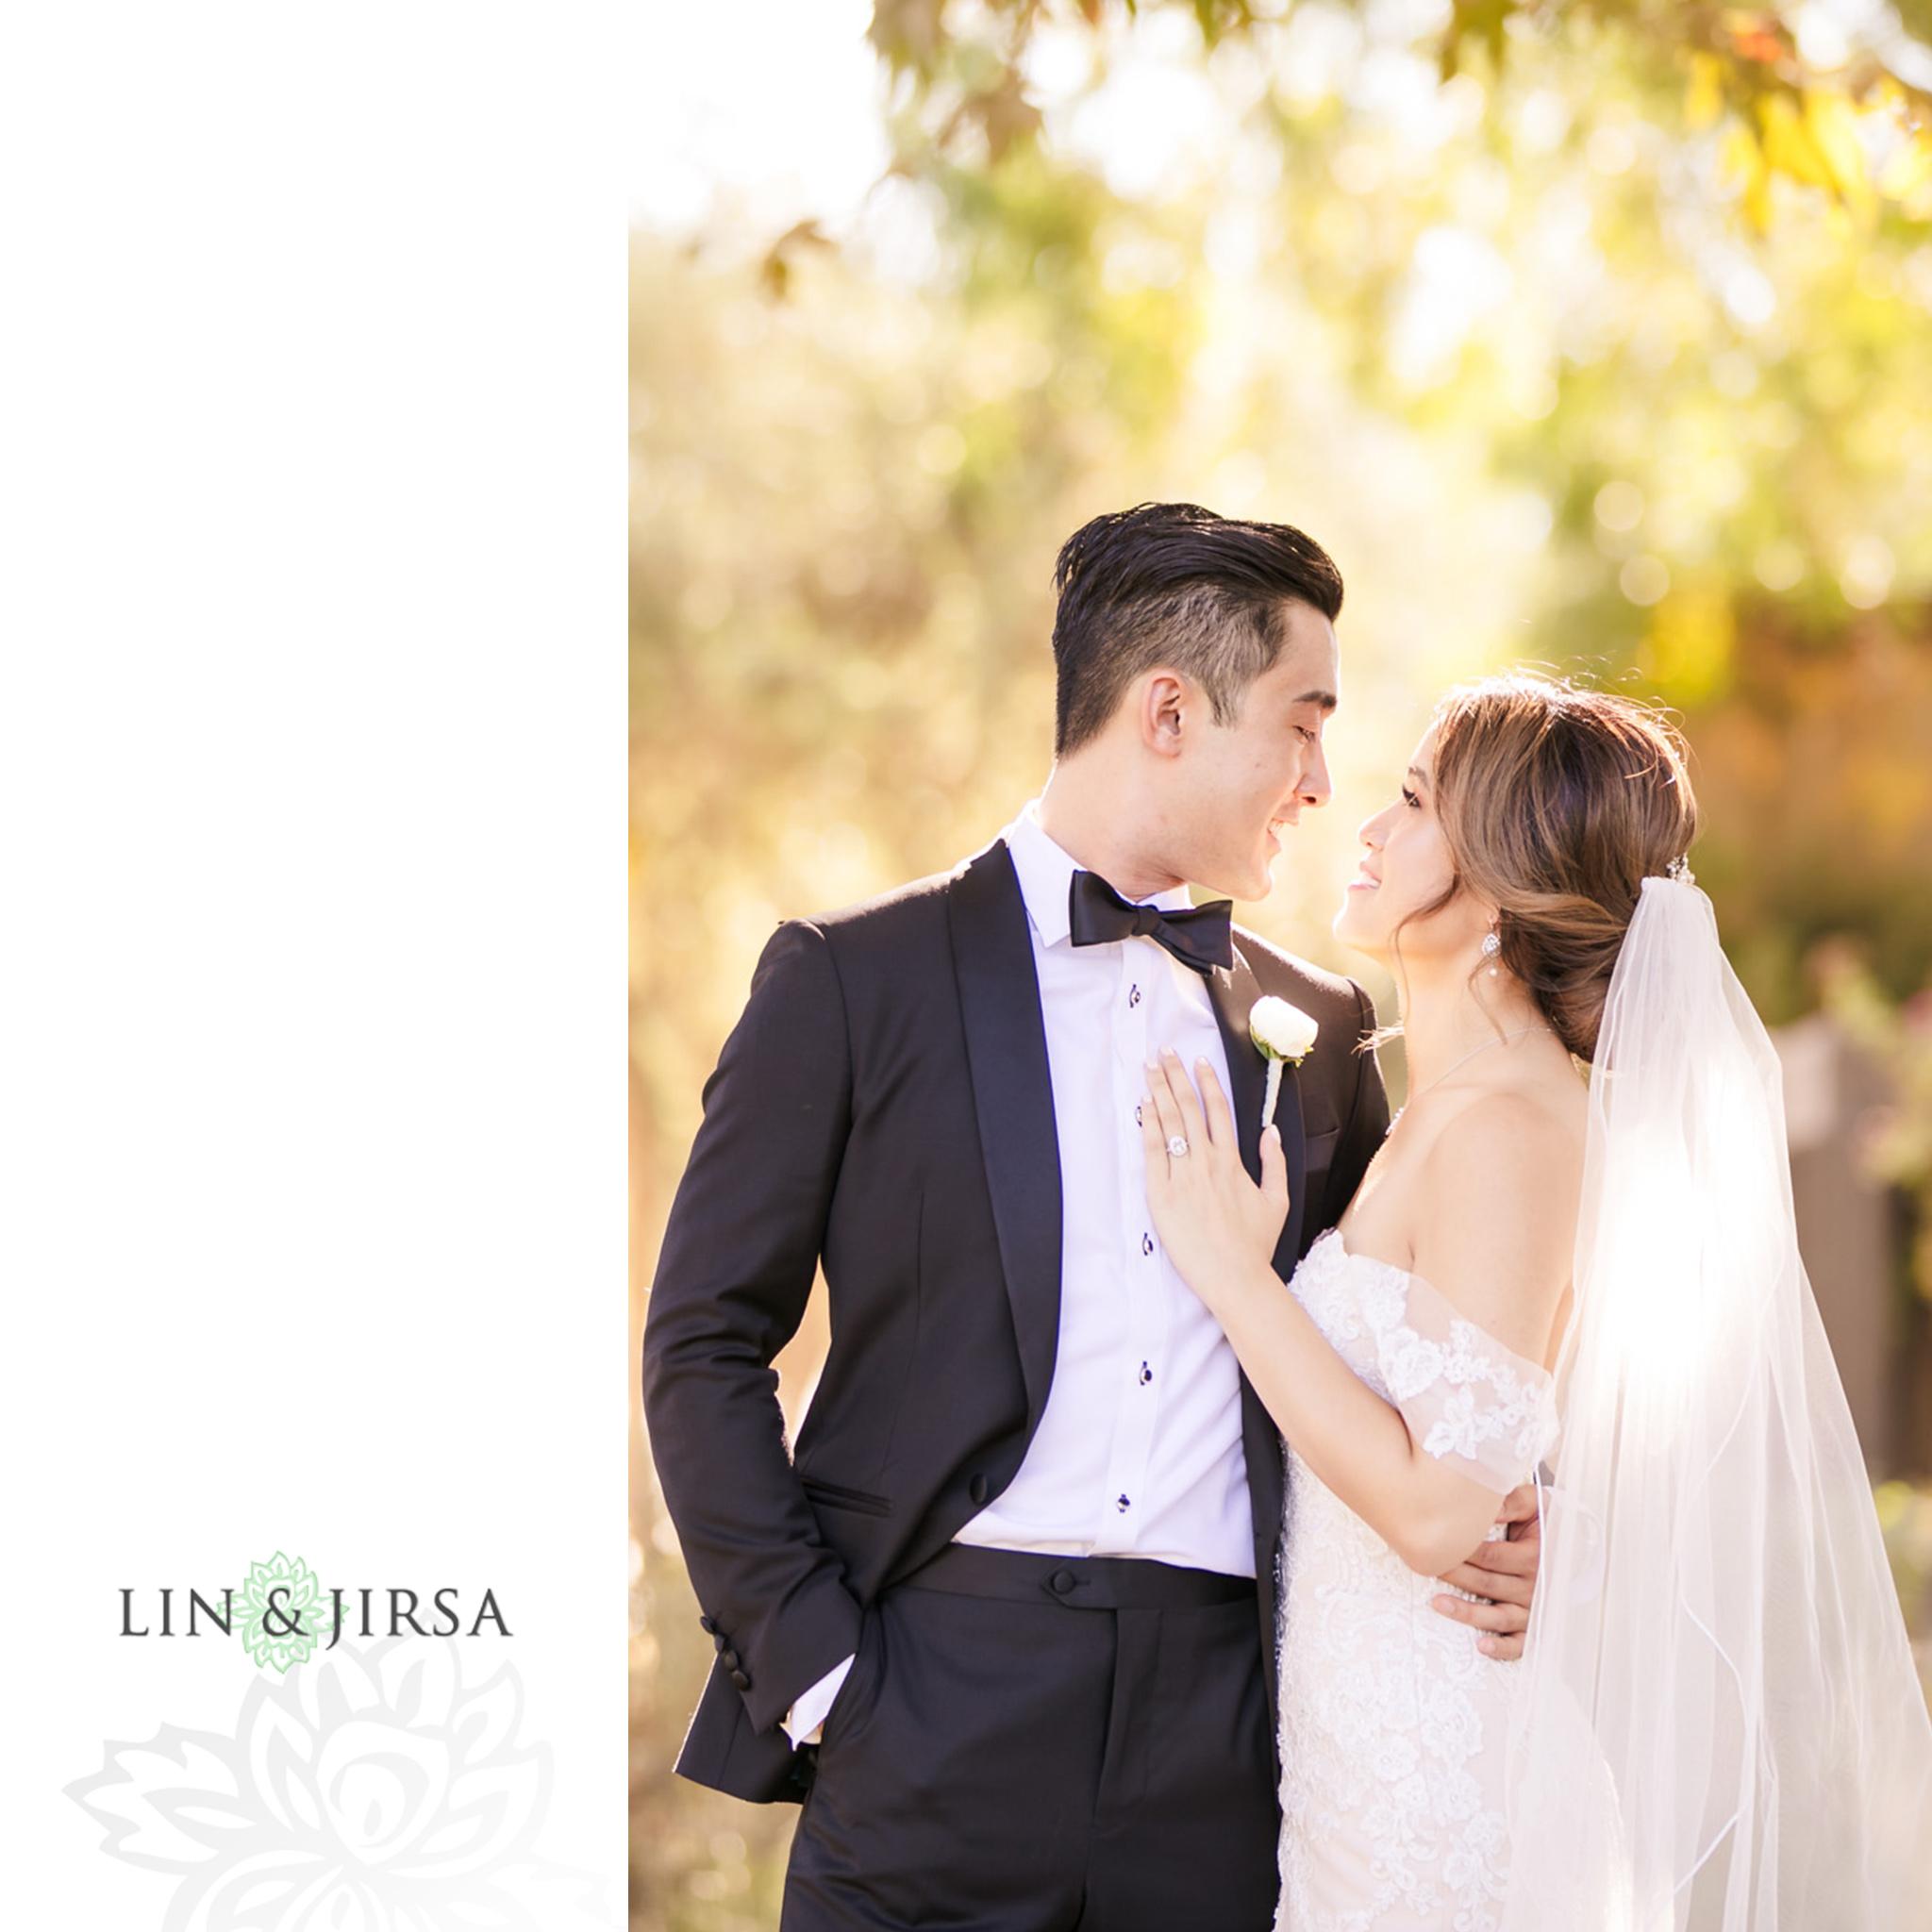 13 Galway Downs Temecula Wedding Photography